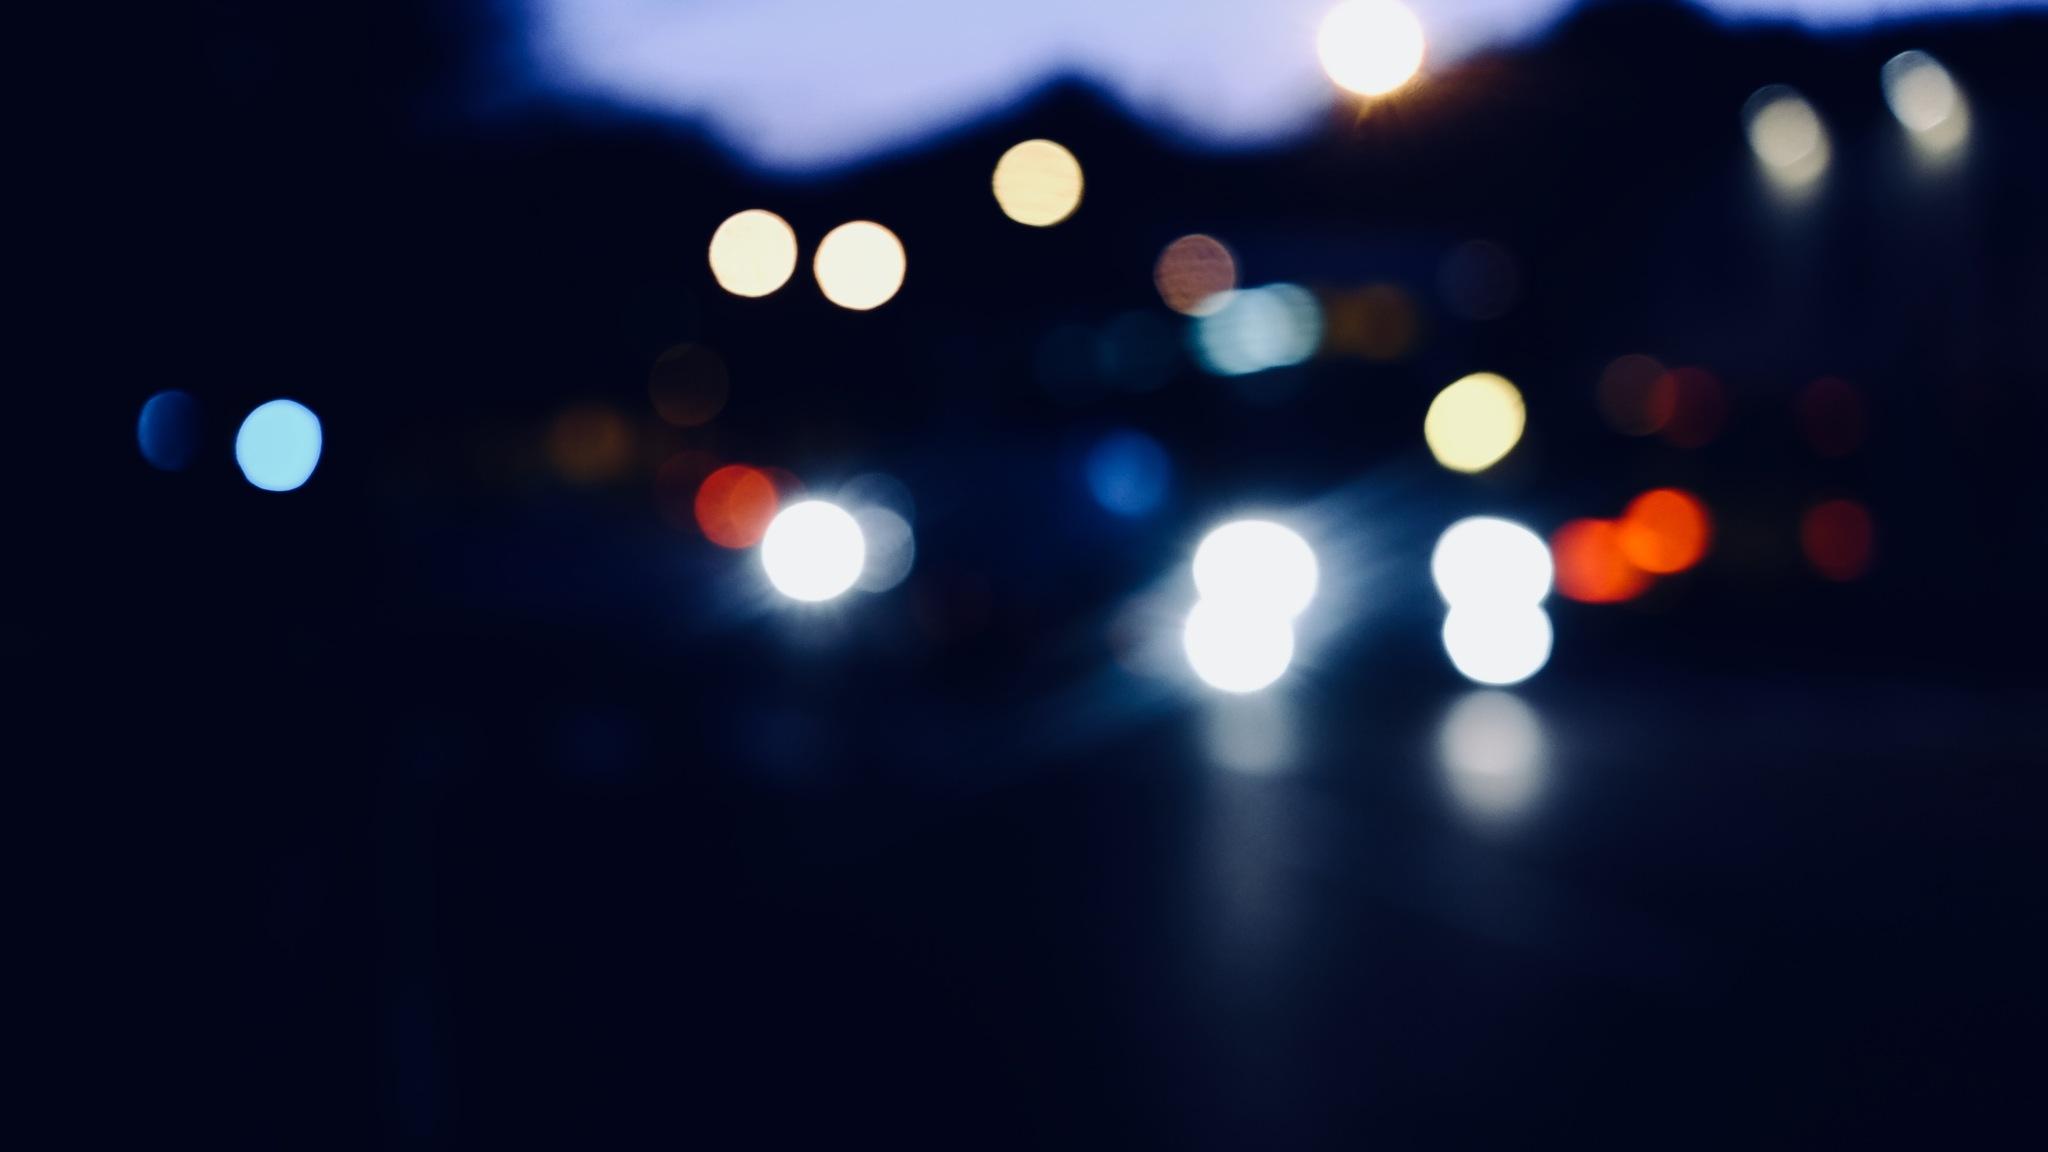 Morning Lights by Mau056